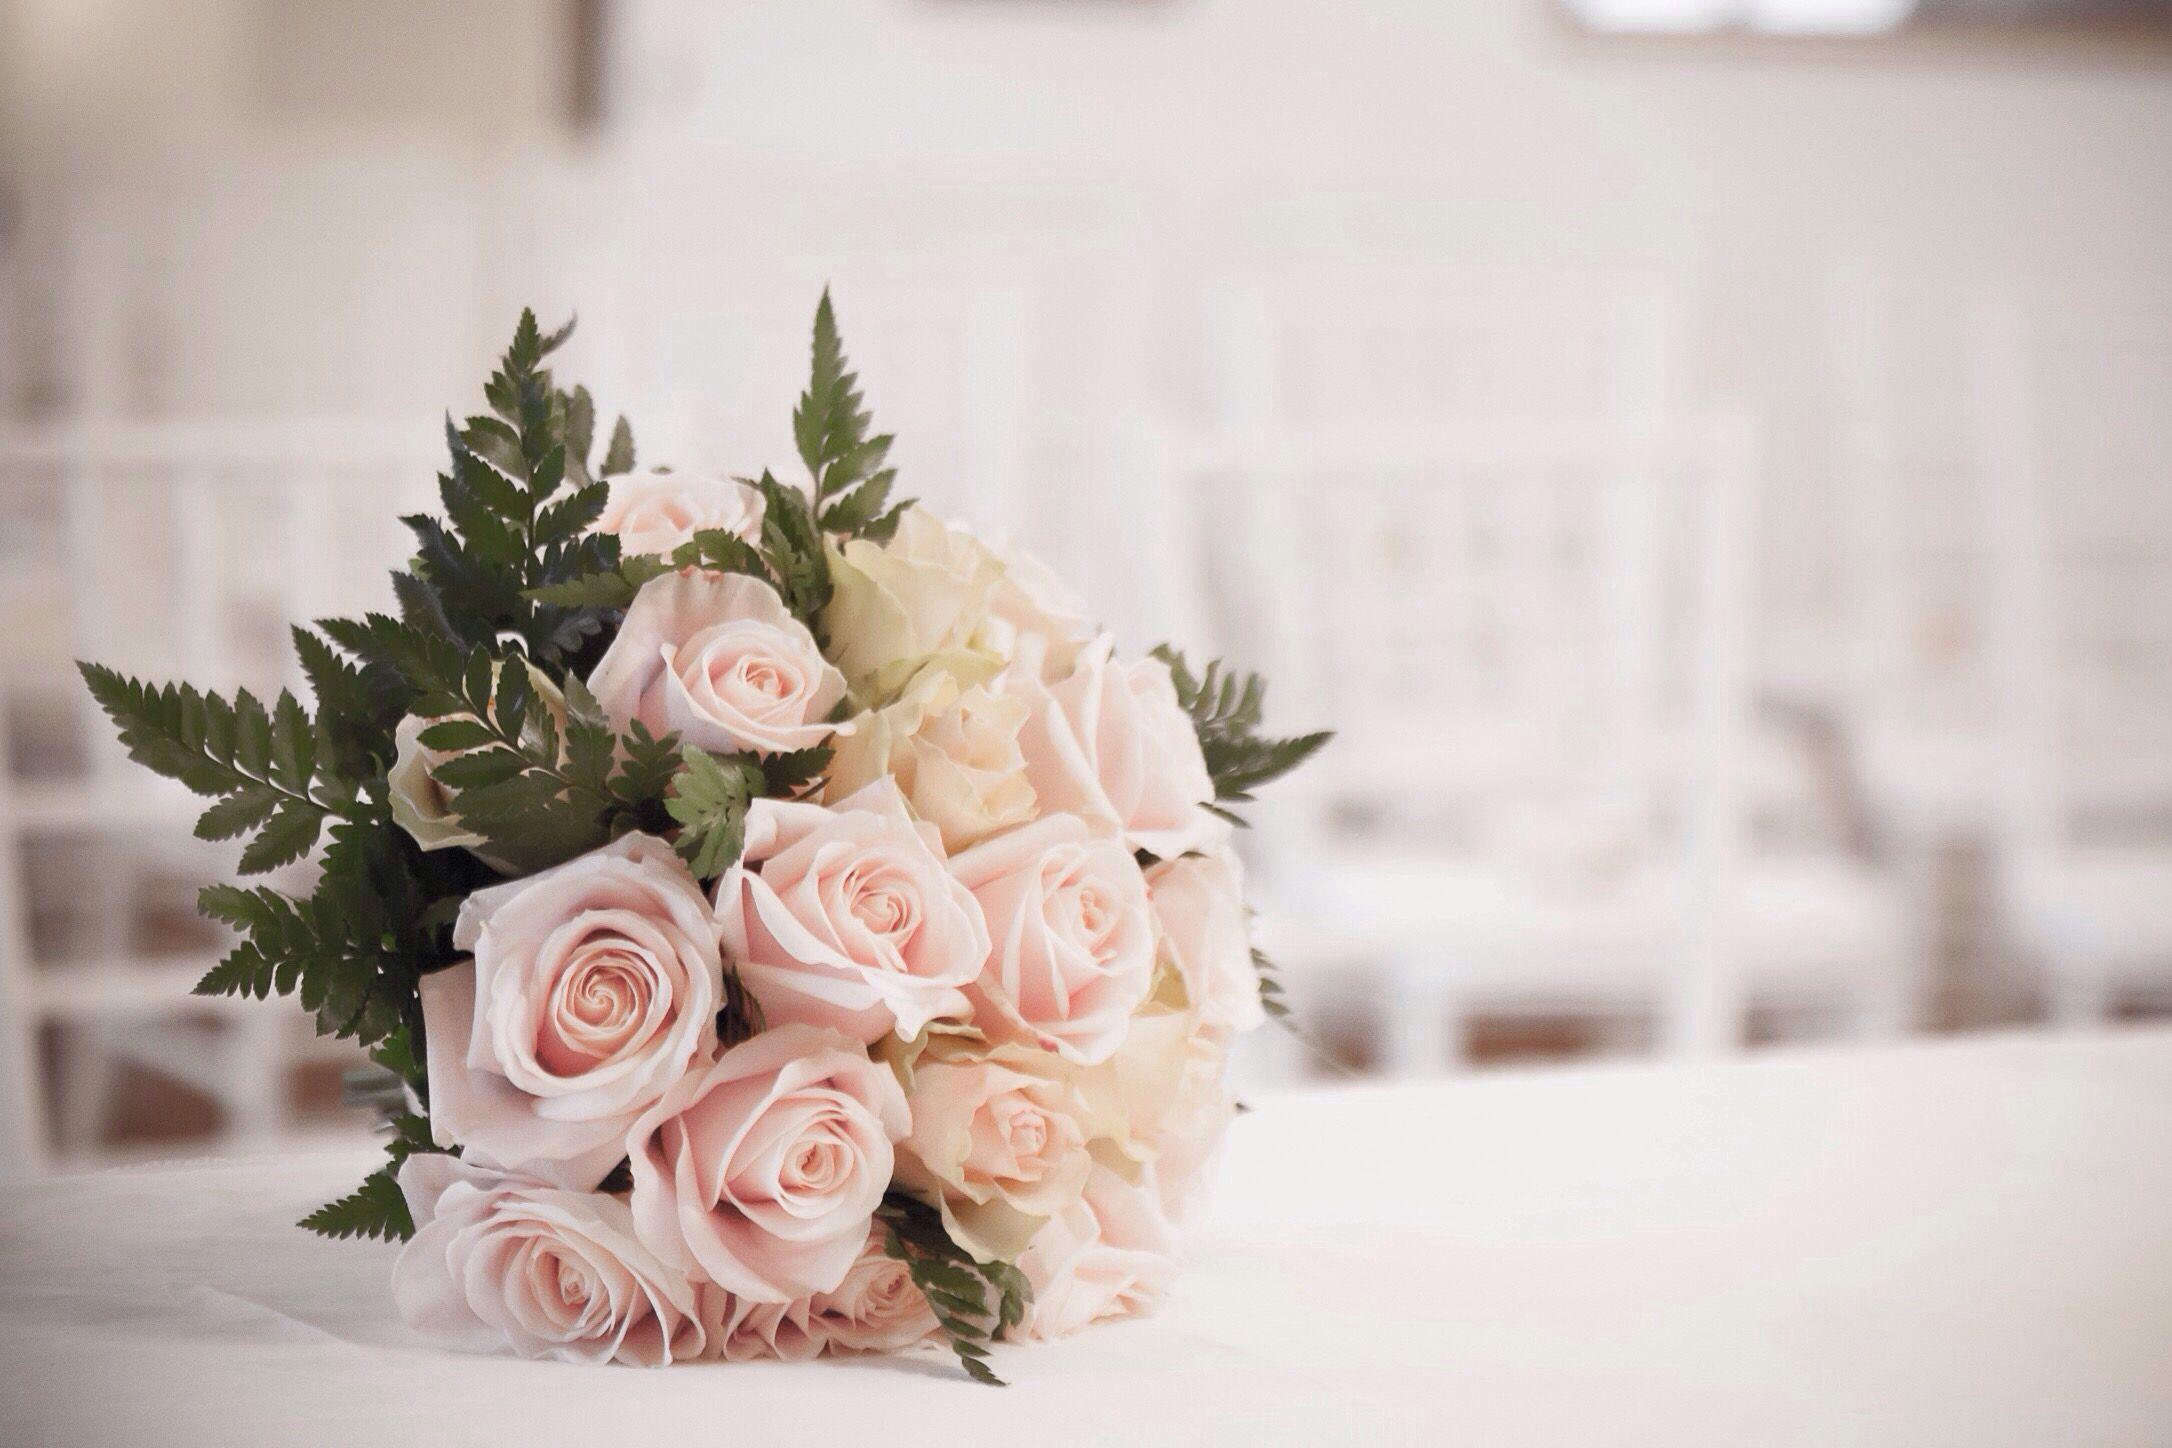 Postponing Or Canceling A Wedding